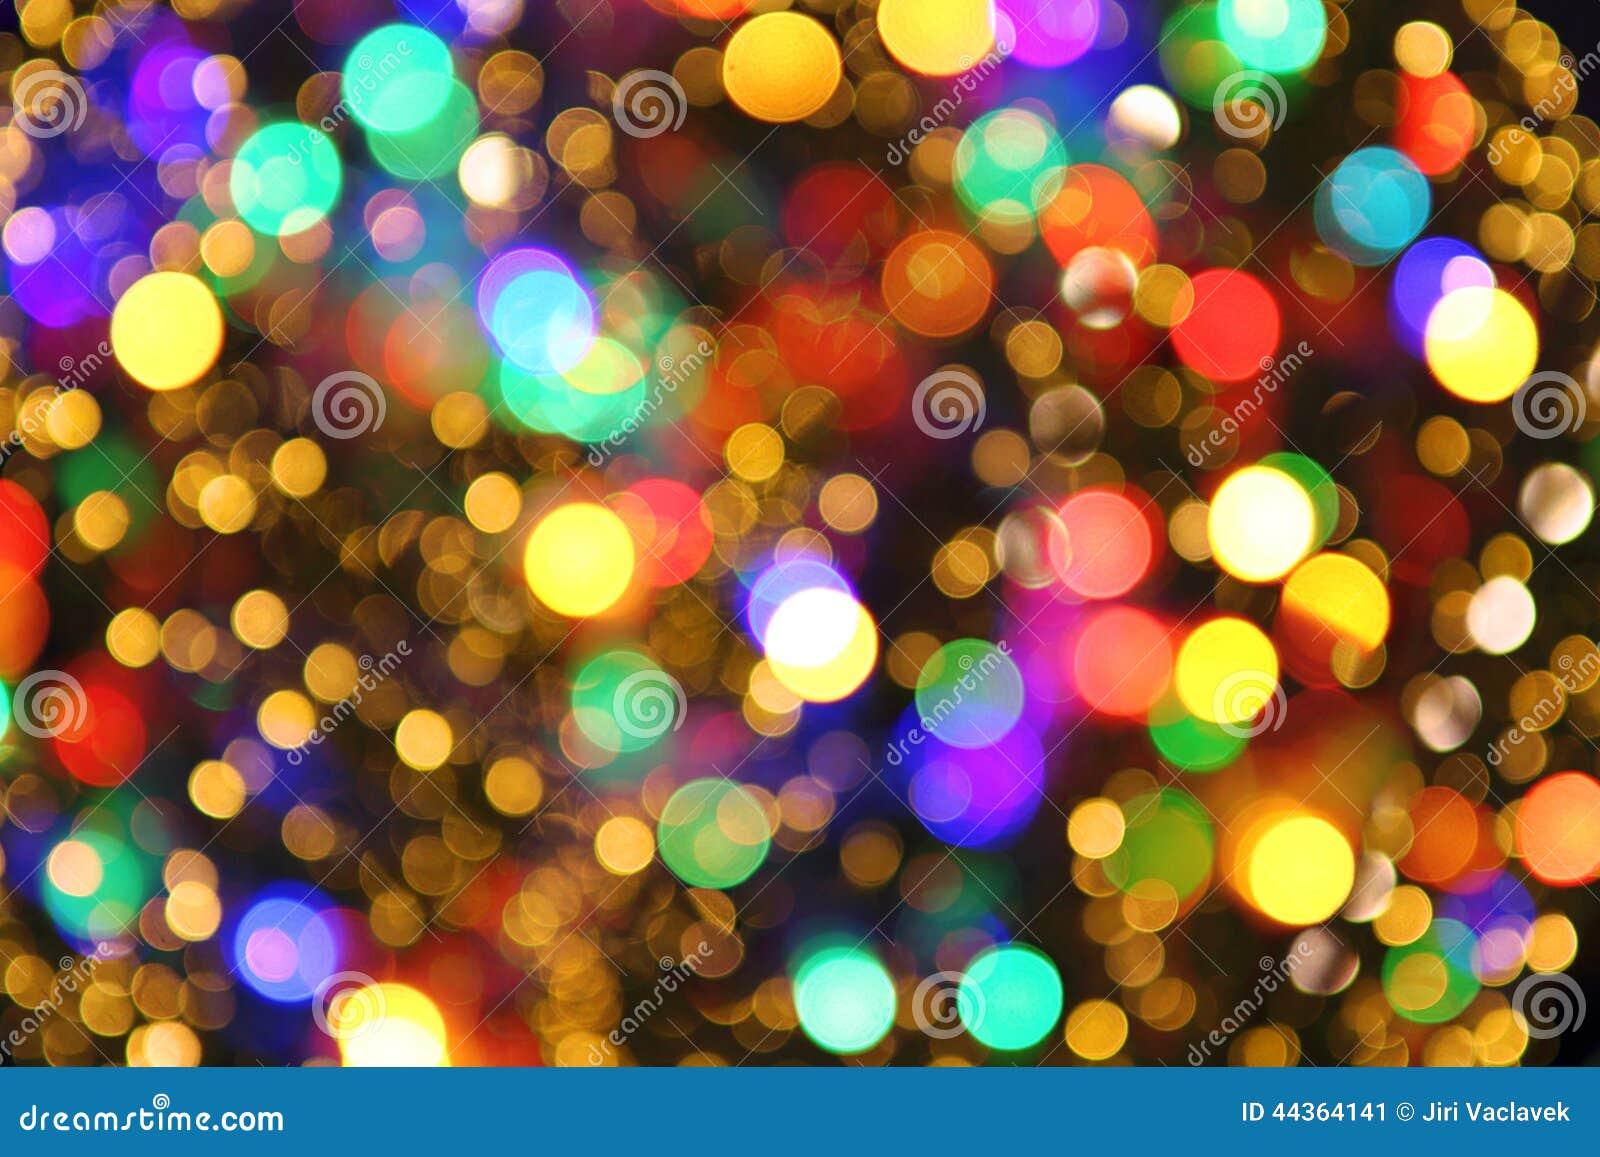 color christmas lights as nice background